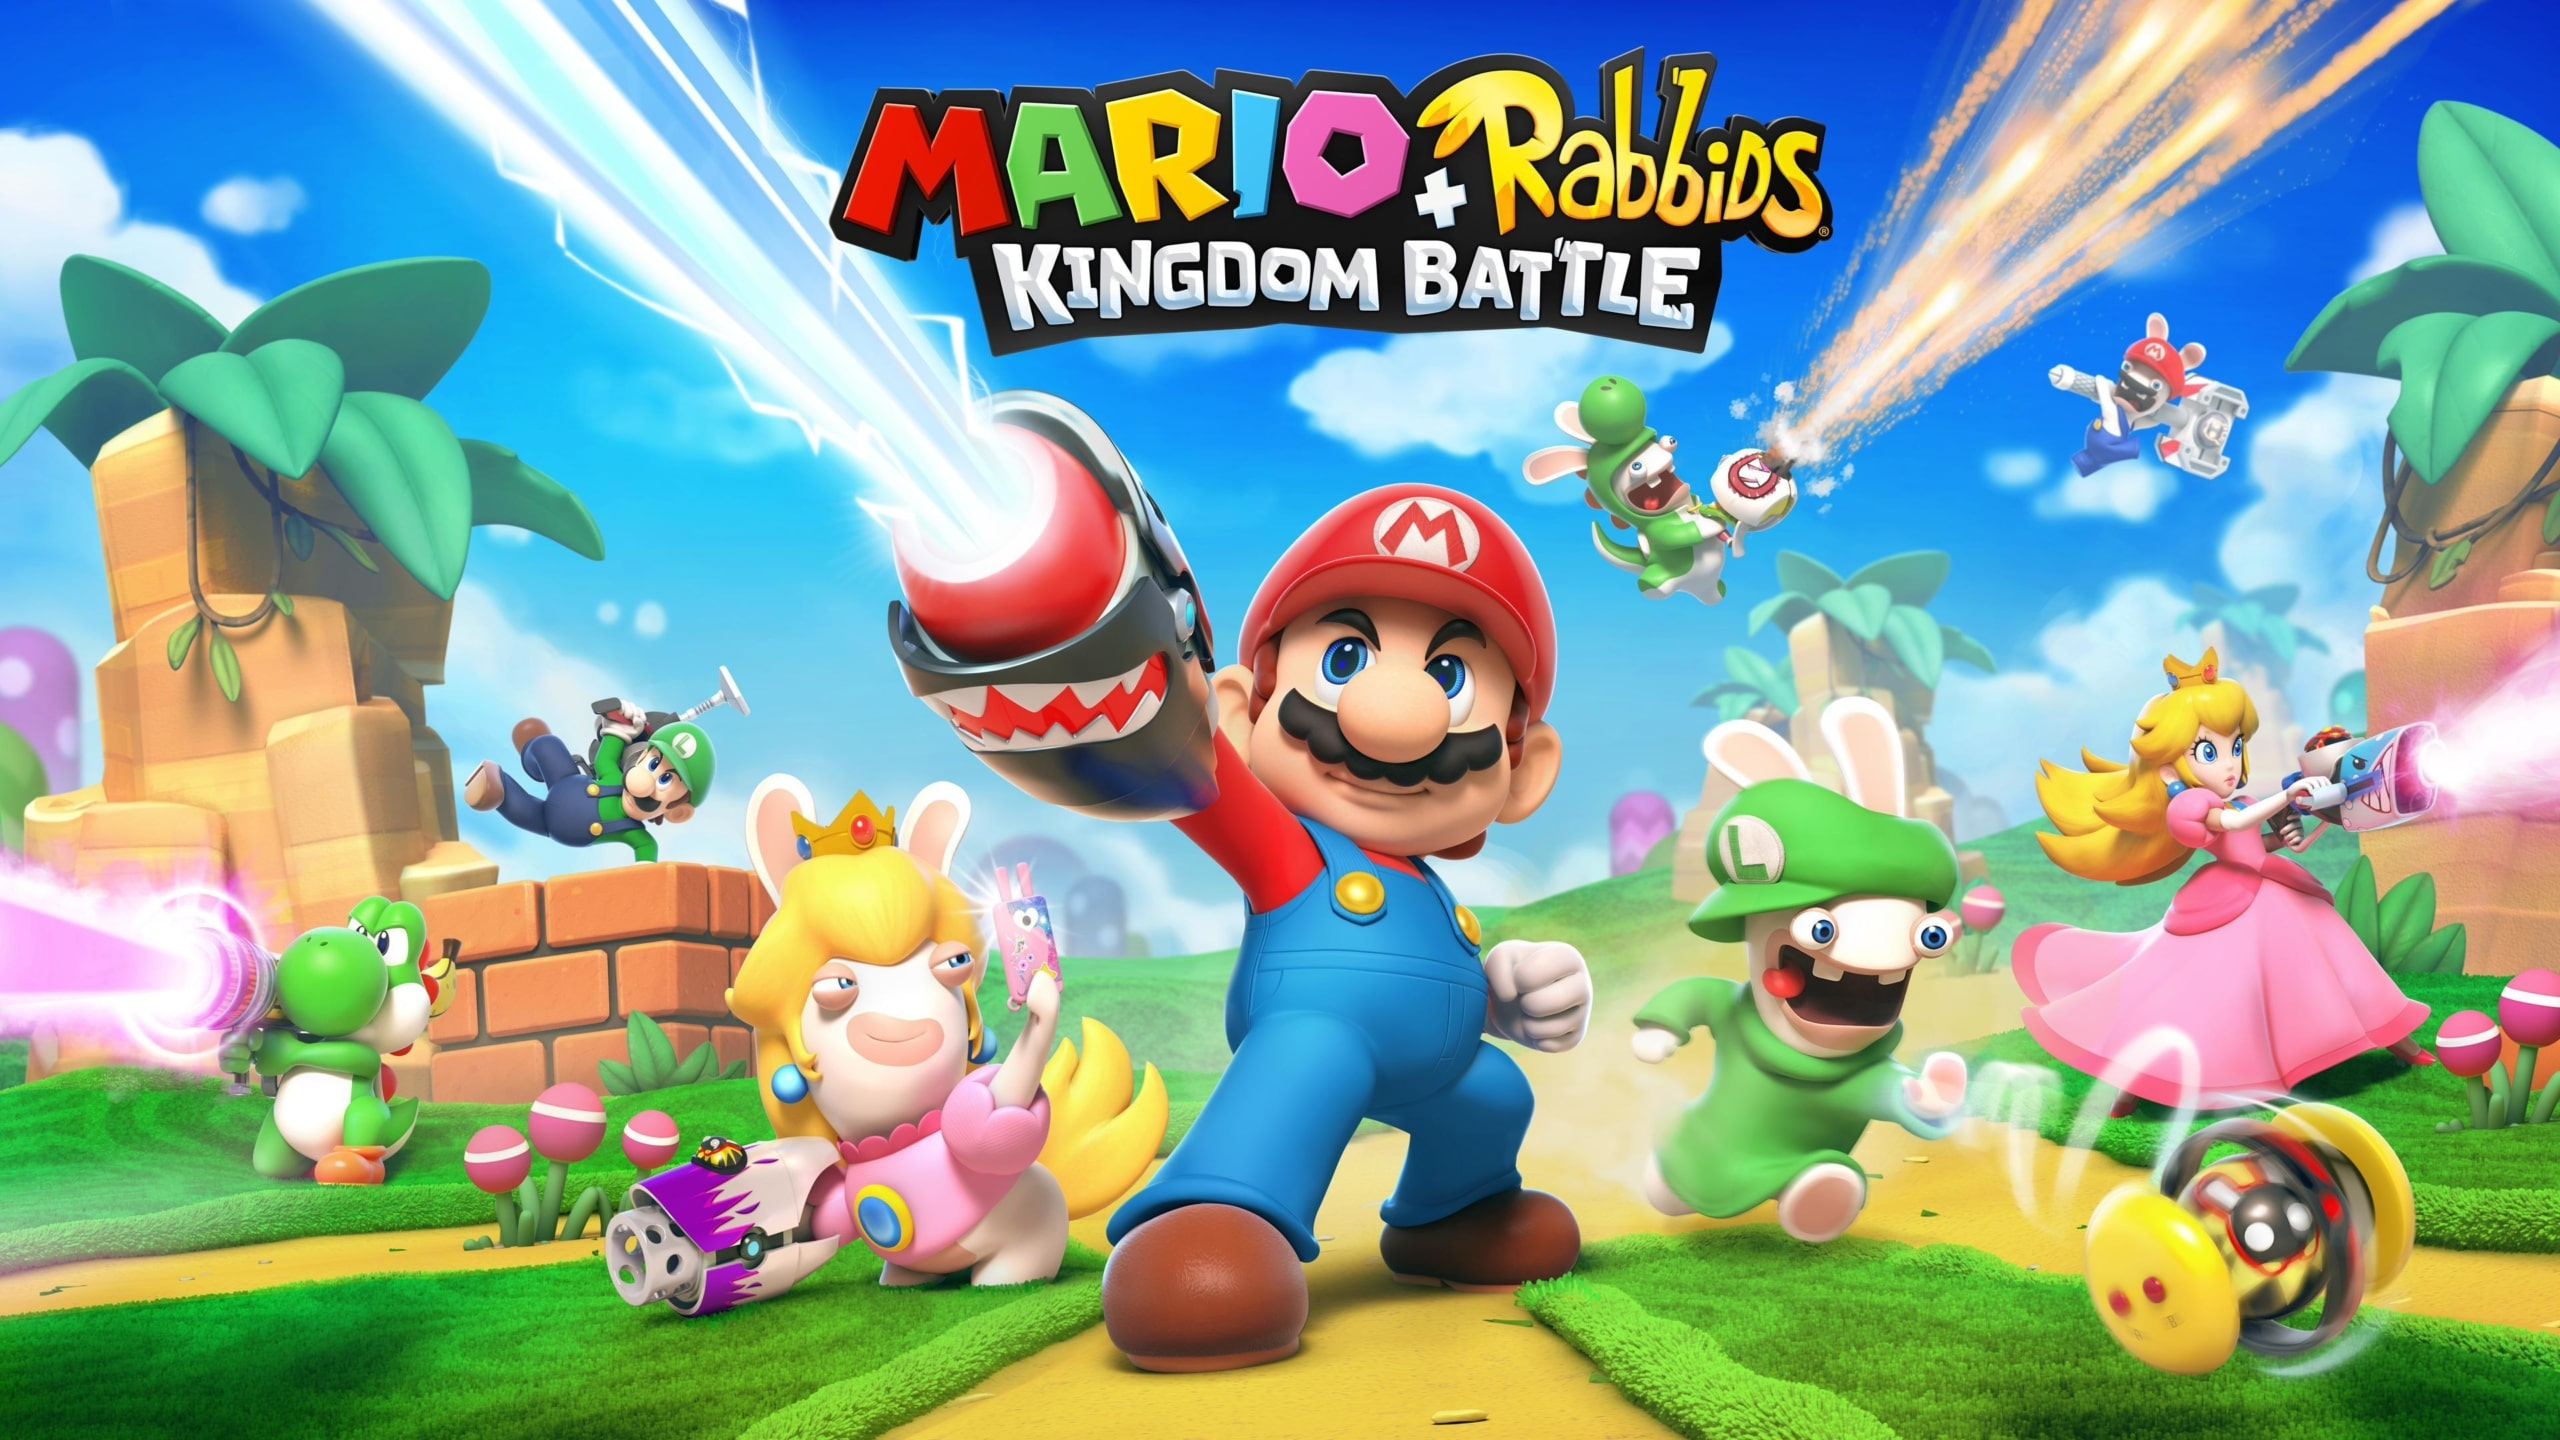 Mario & Rabbids Kingdom Battle Poster